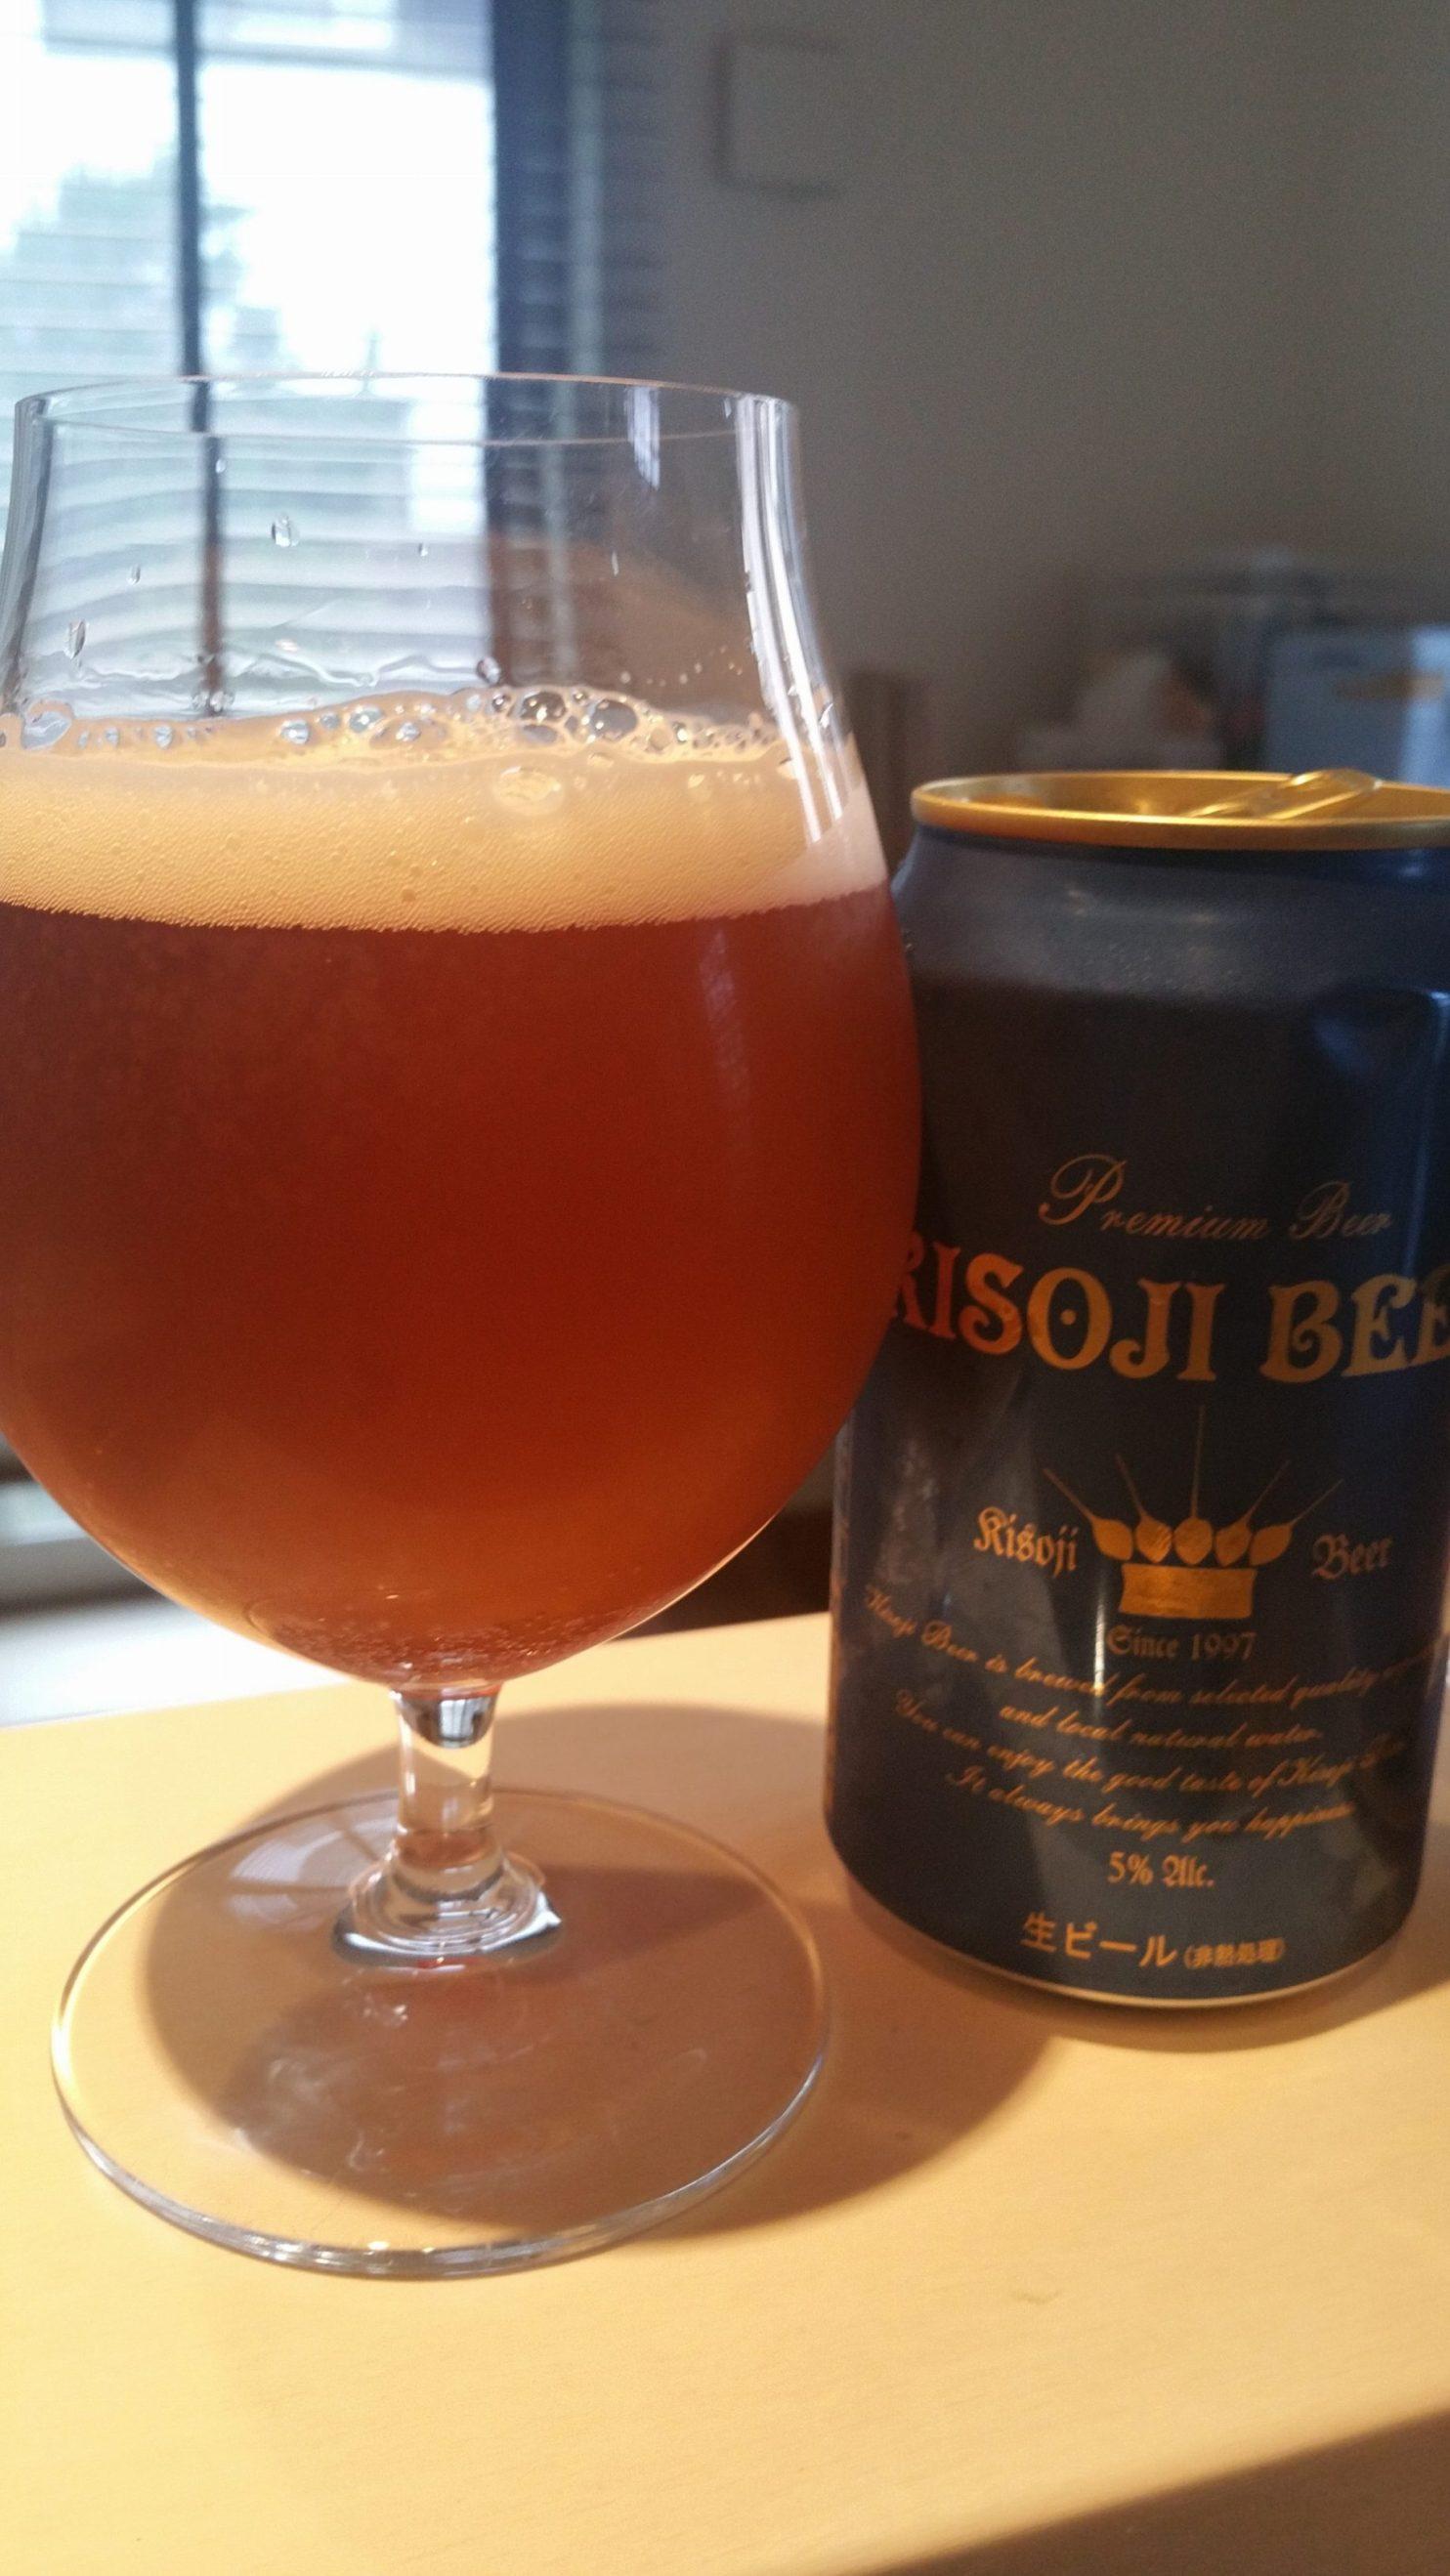 Kisoji Smoked Ale